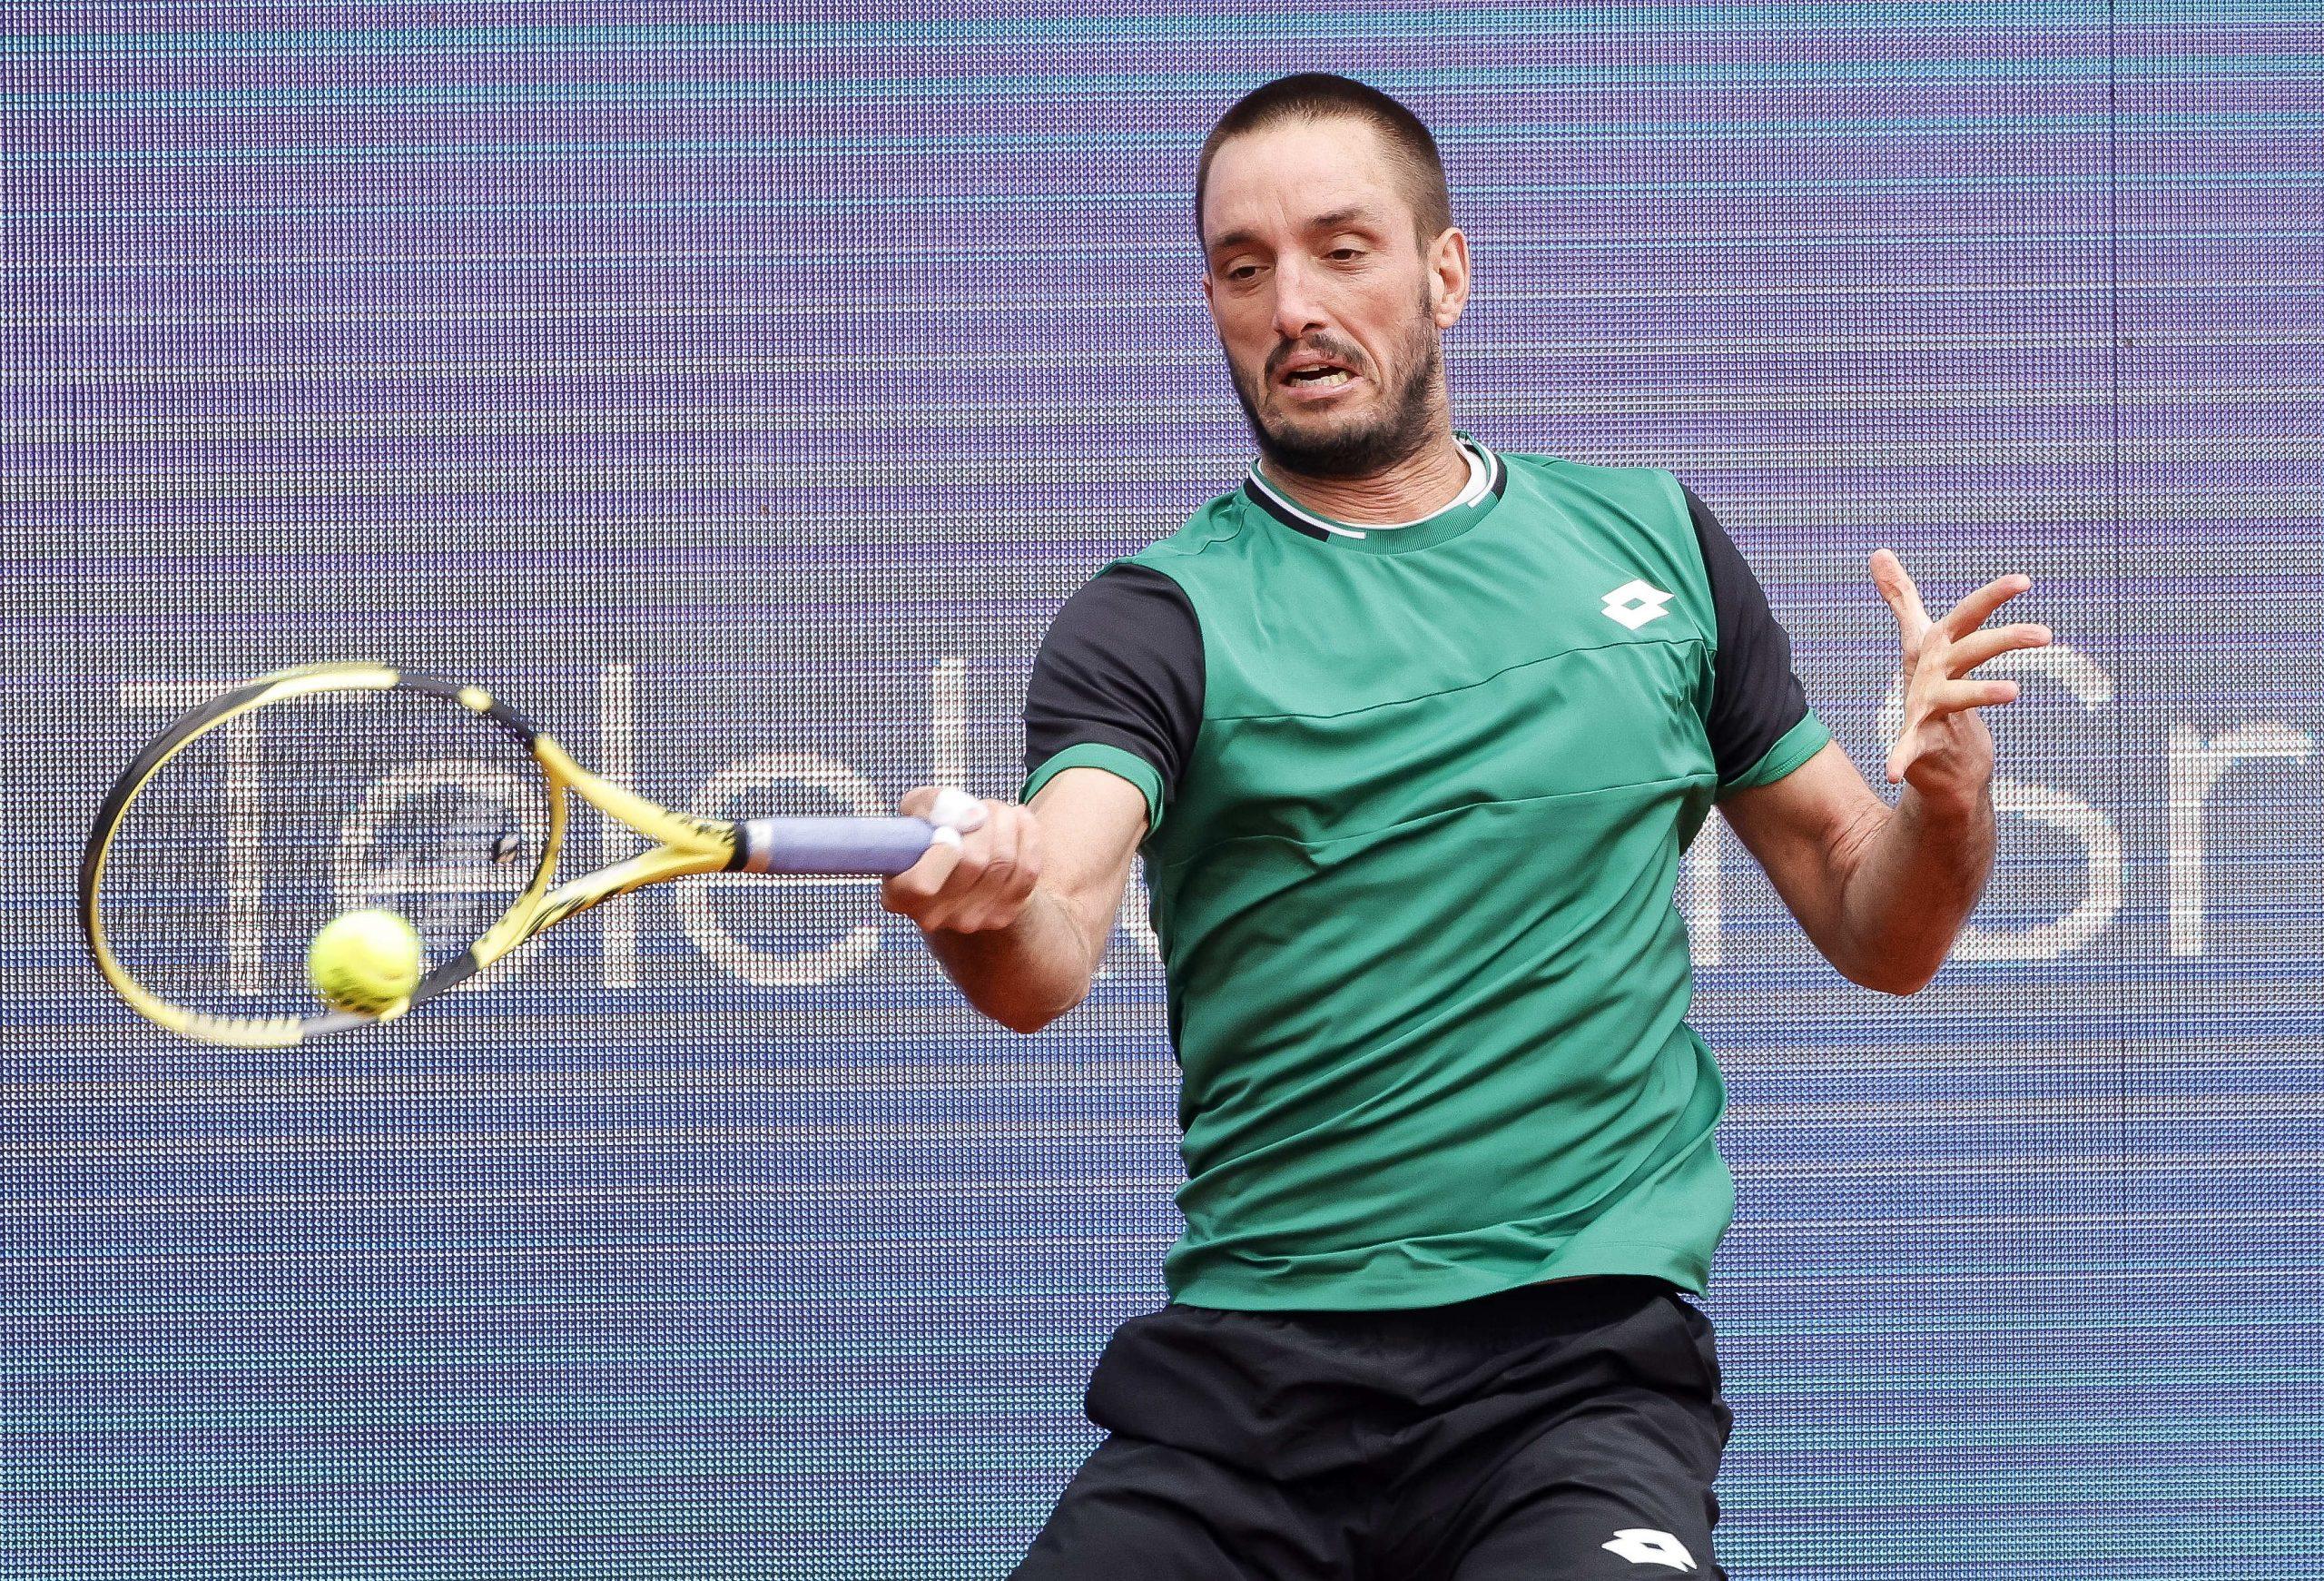 Viktor Troicki Serbia Open 2021